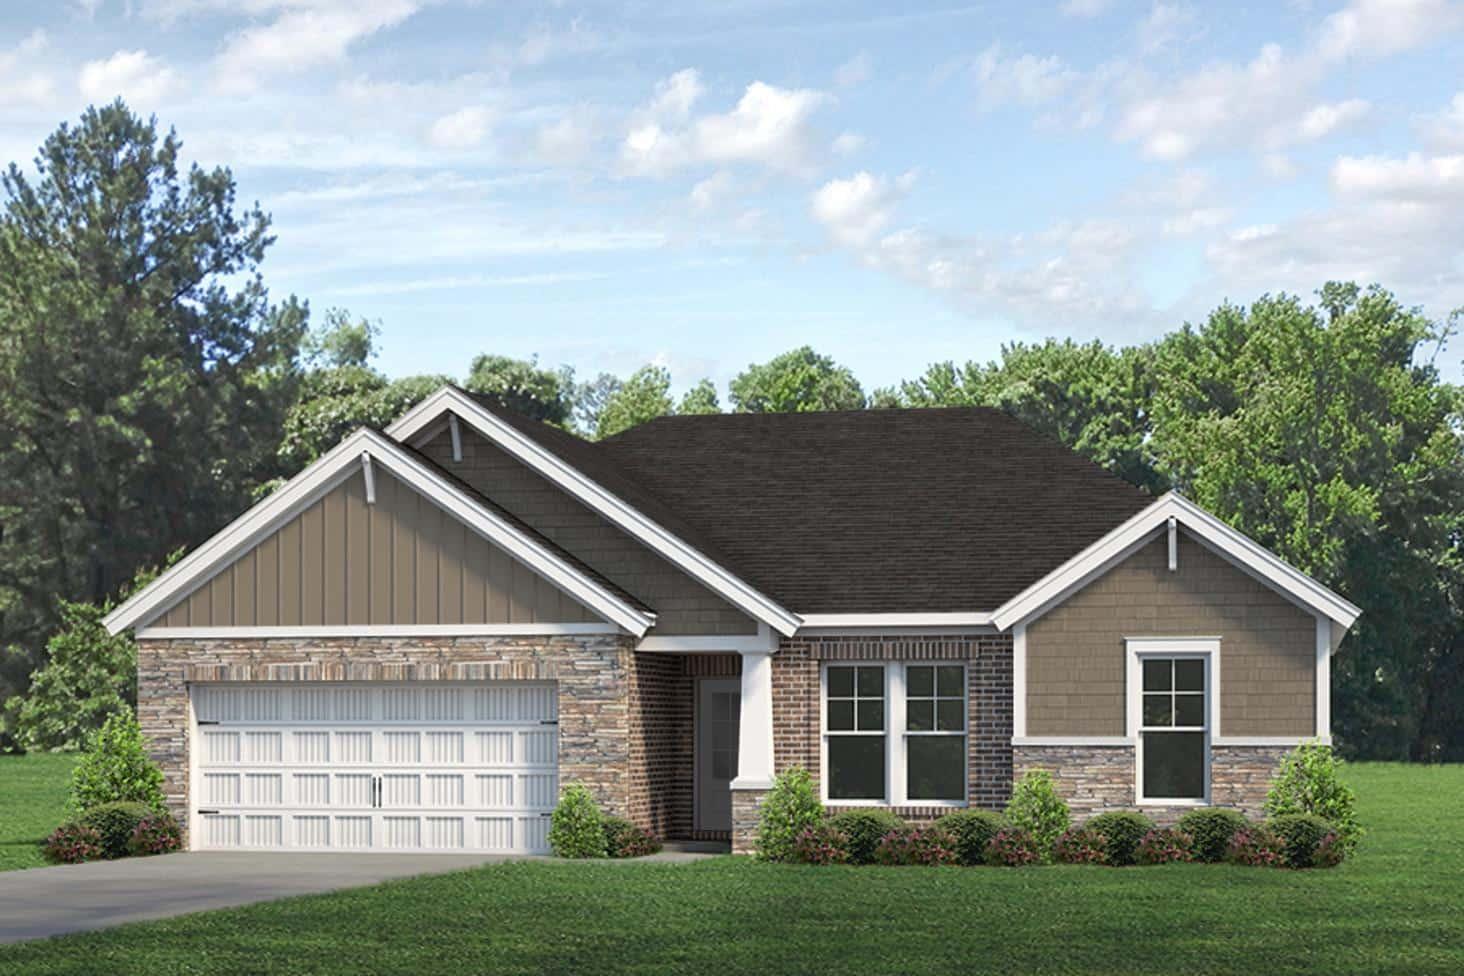 Fall Tour of Homes - #14 Chadwick at Berkshire | 4985 White Chapel Drive, 47630